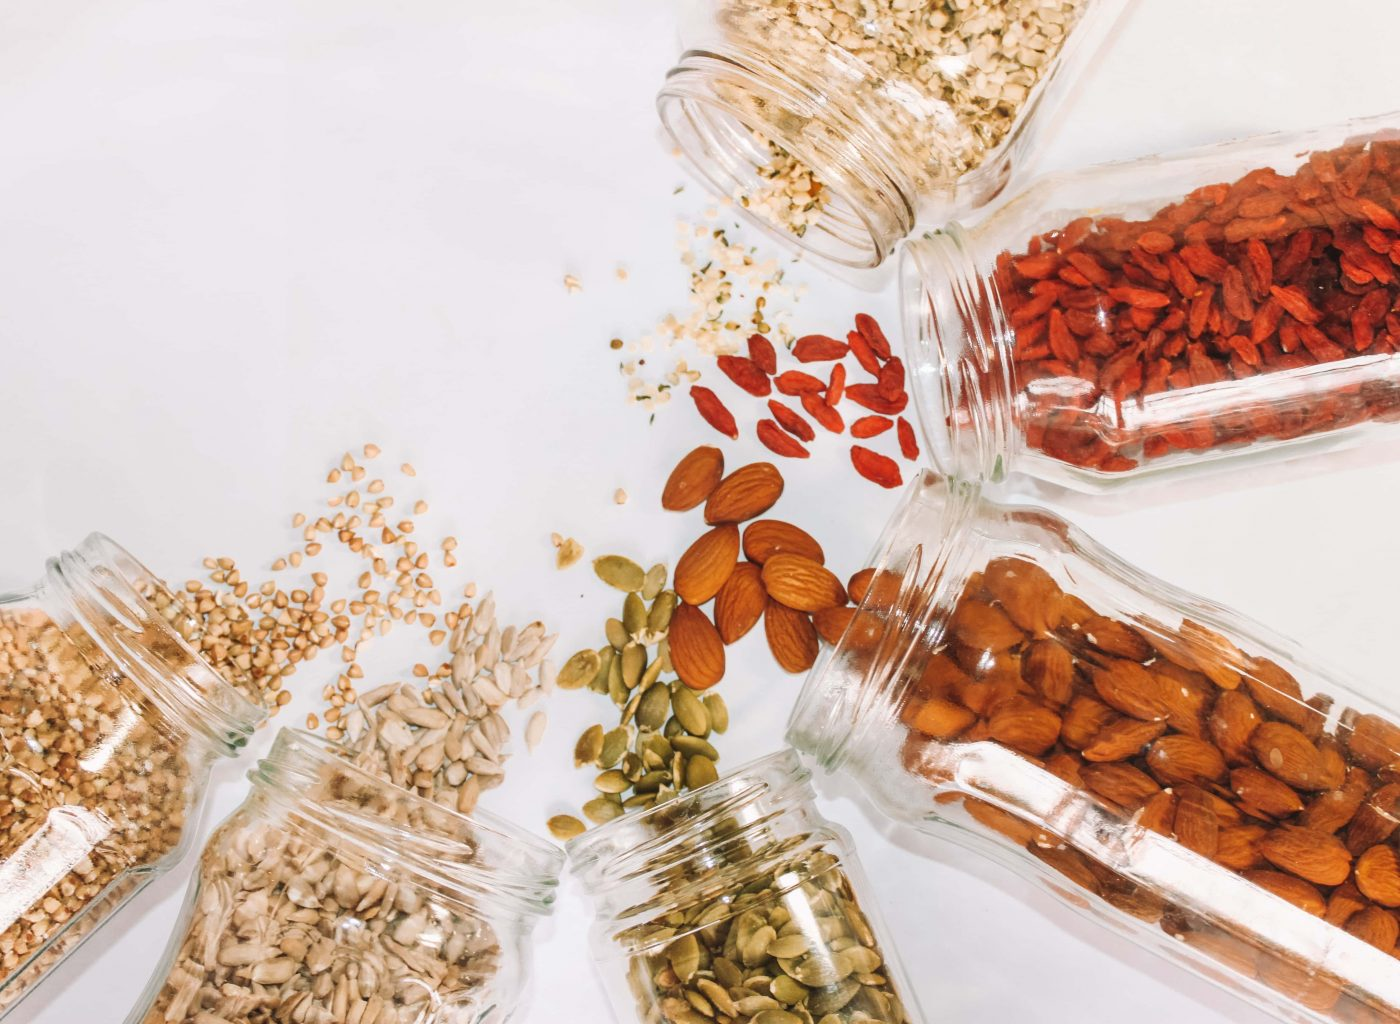 Seeds: Little Nutrition Powerhouses